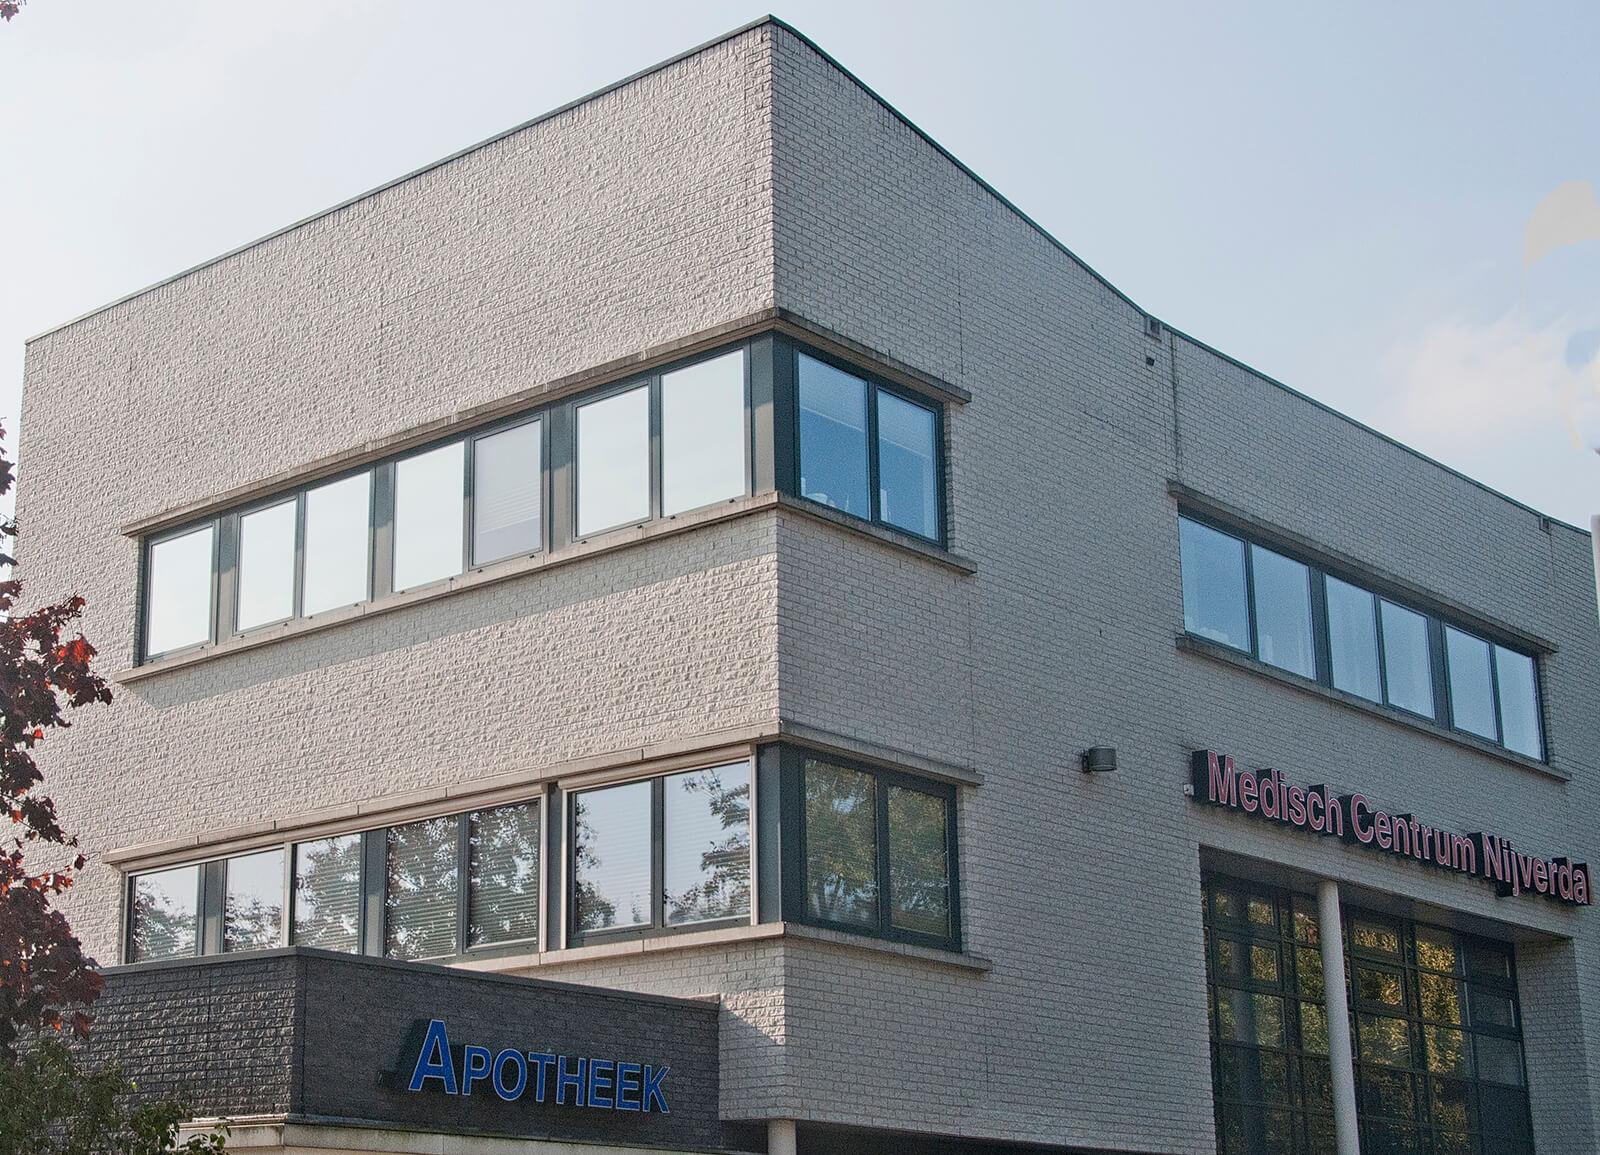 Medisch Centrum Nijverdal